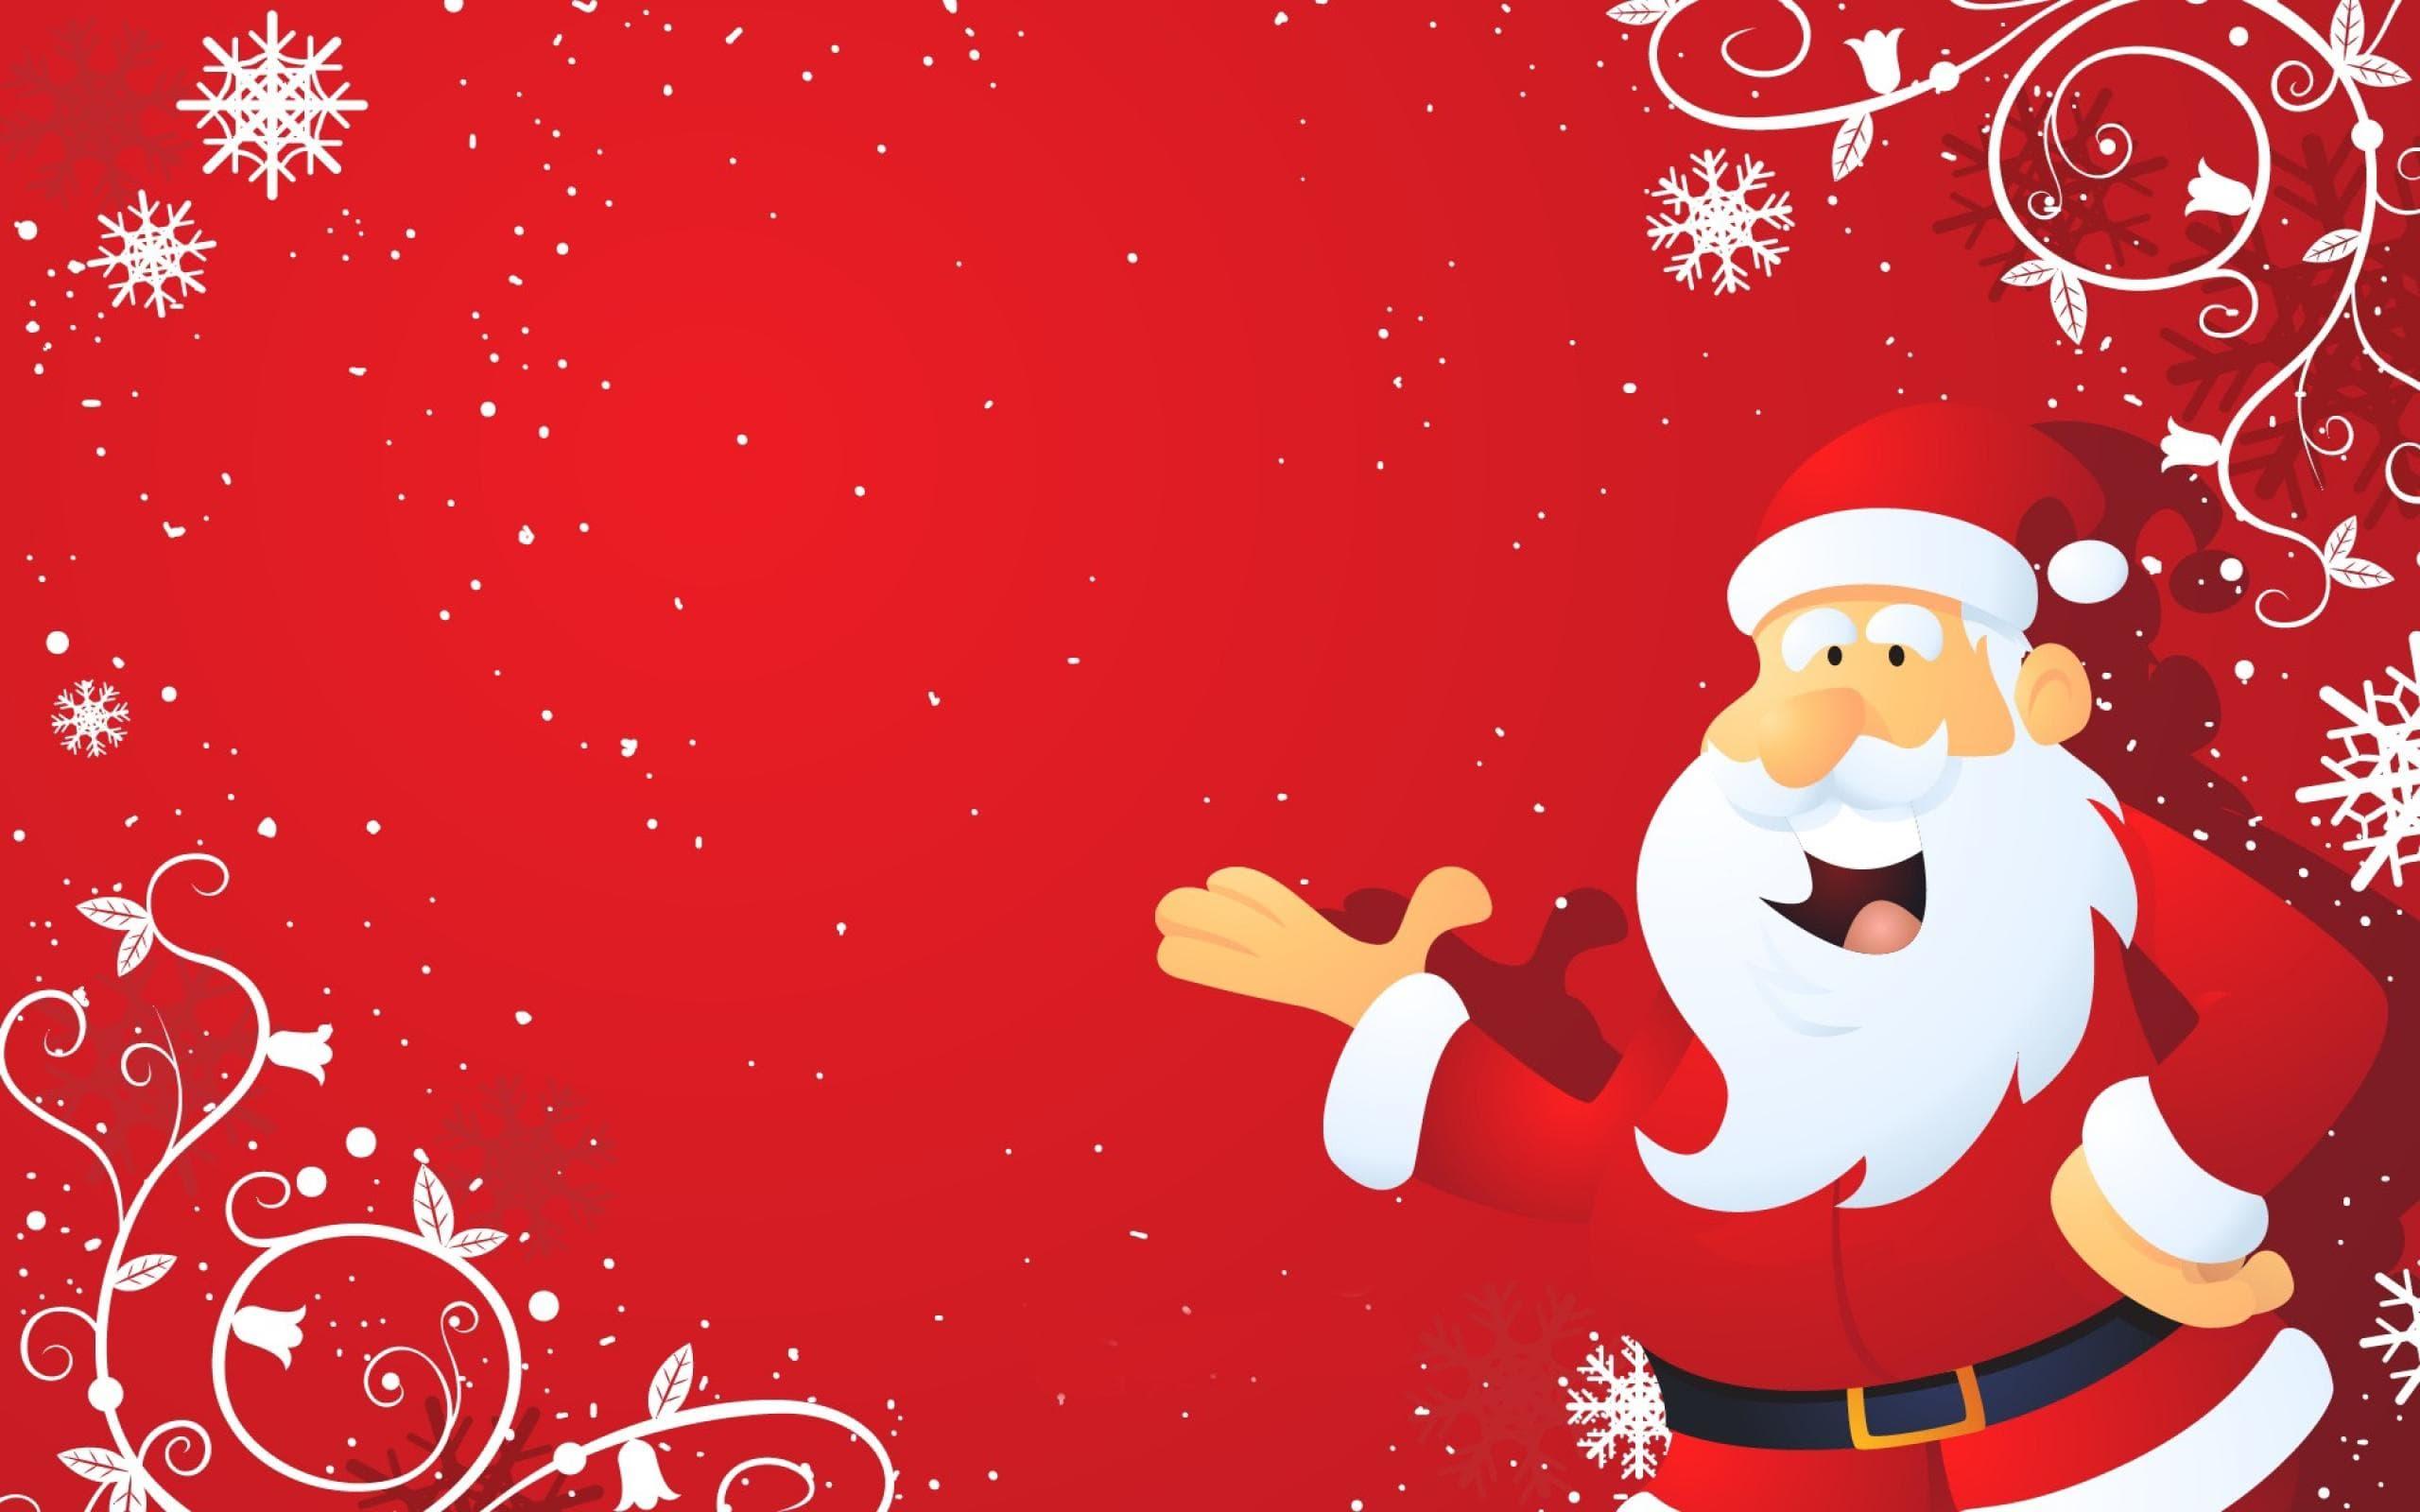 Santa Claus widescreen wallpapers